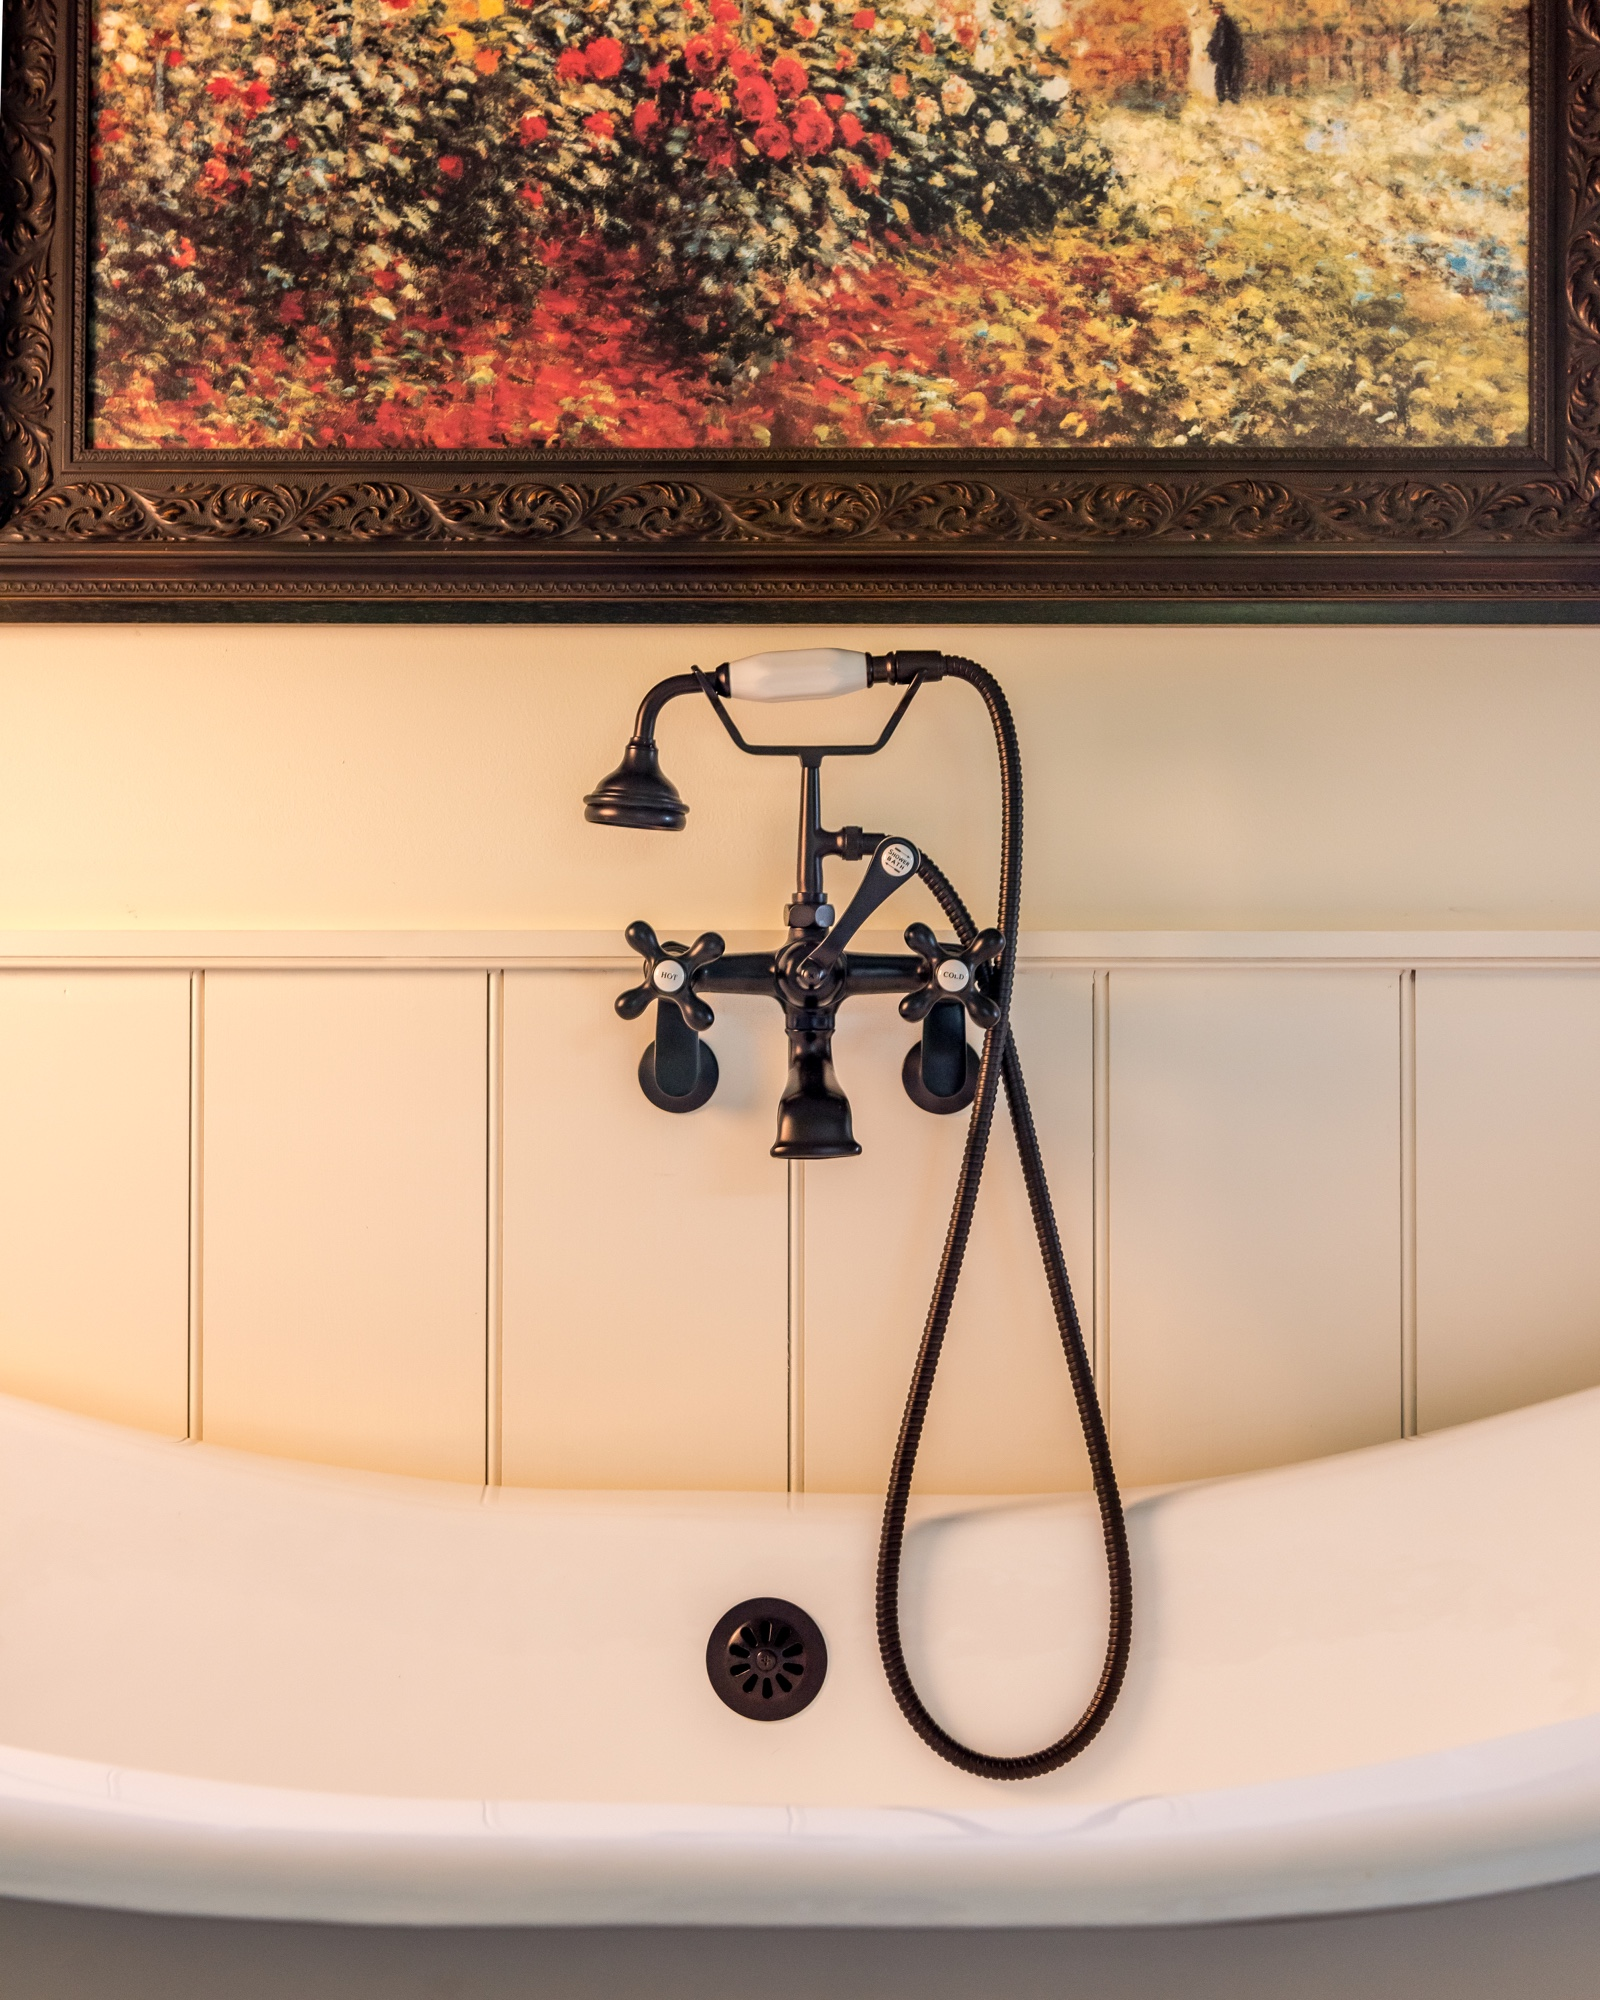 Pennsylvania Farmhouse Chadds Ford bathtub wainscotting